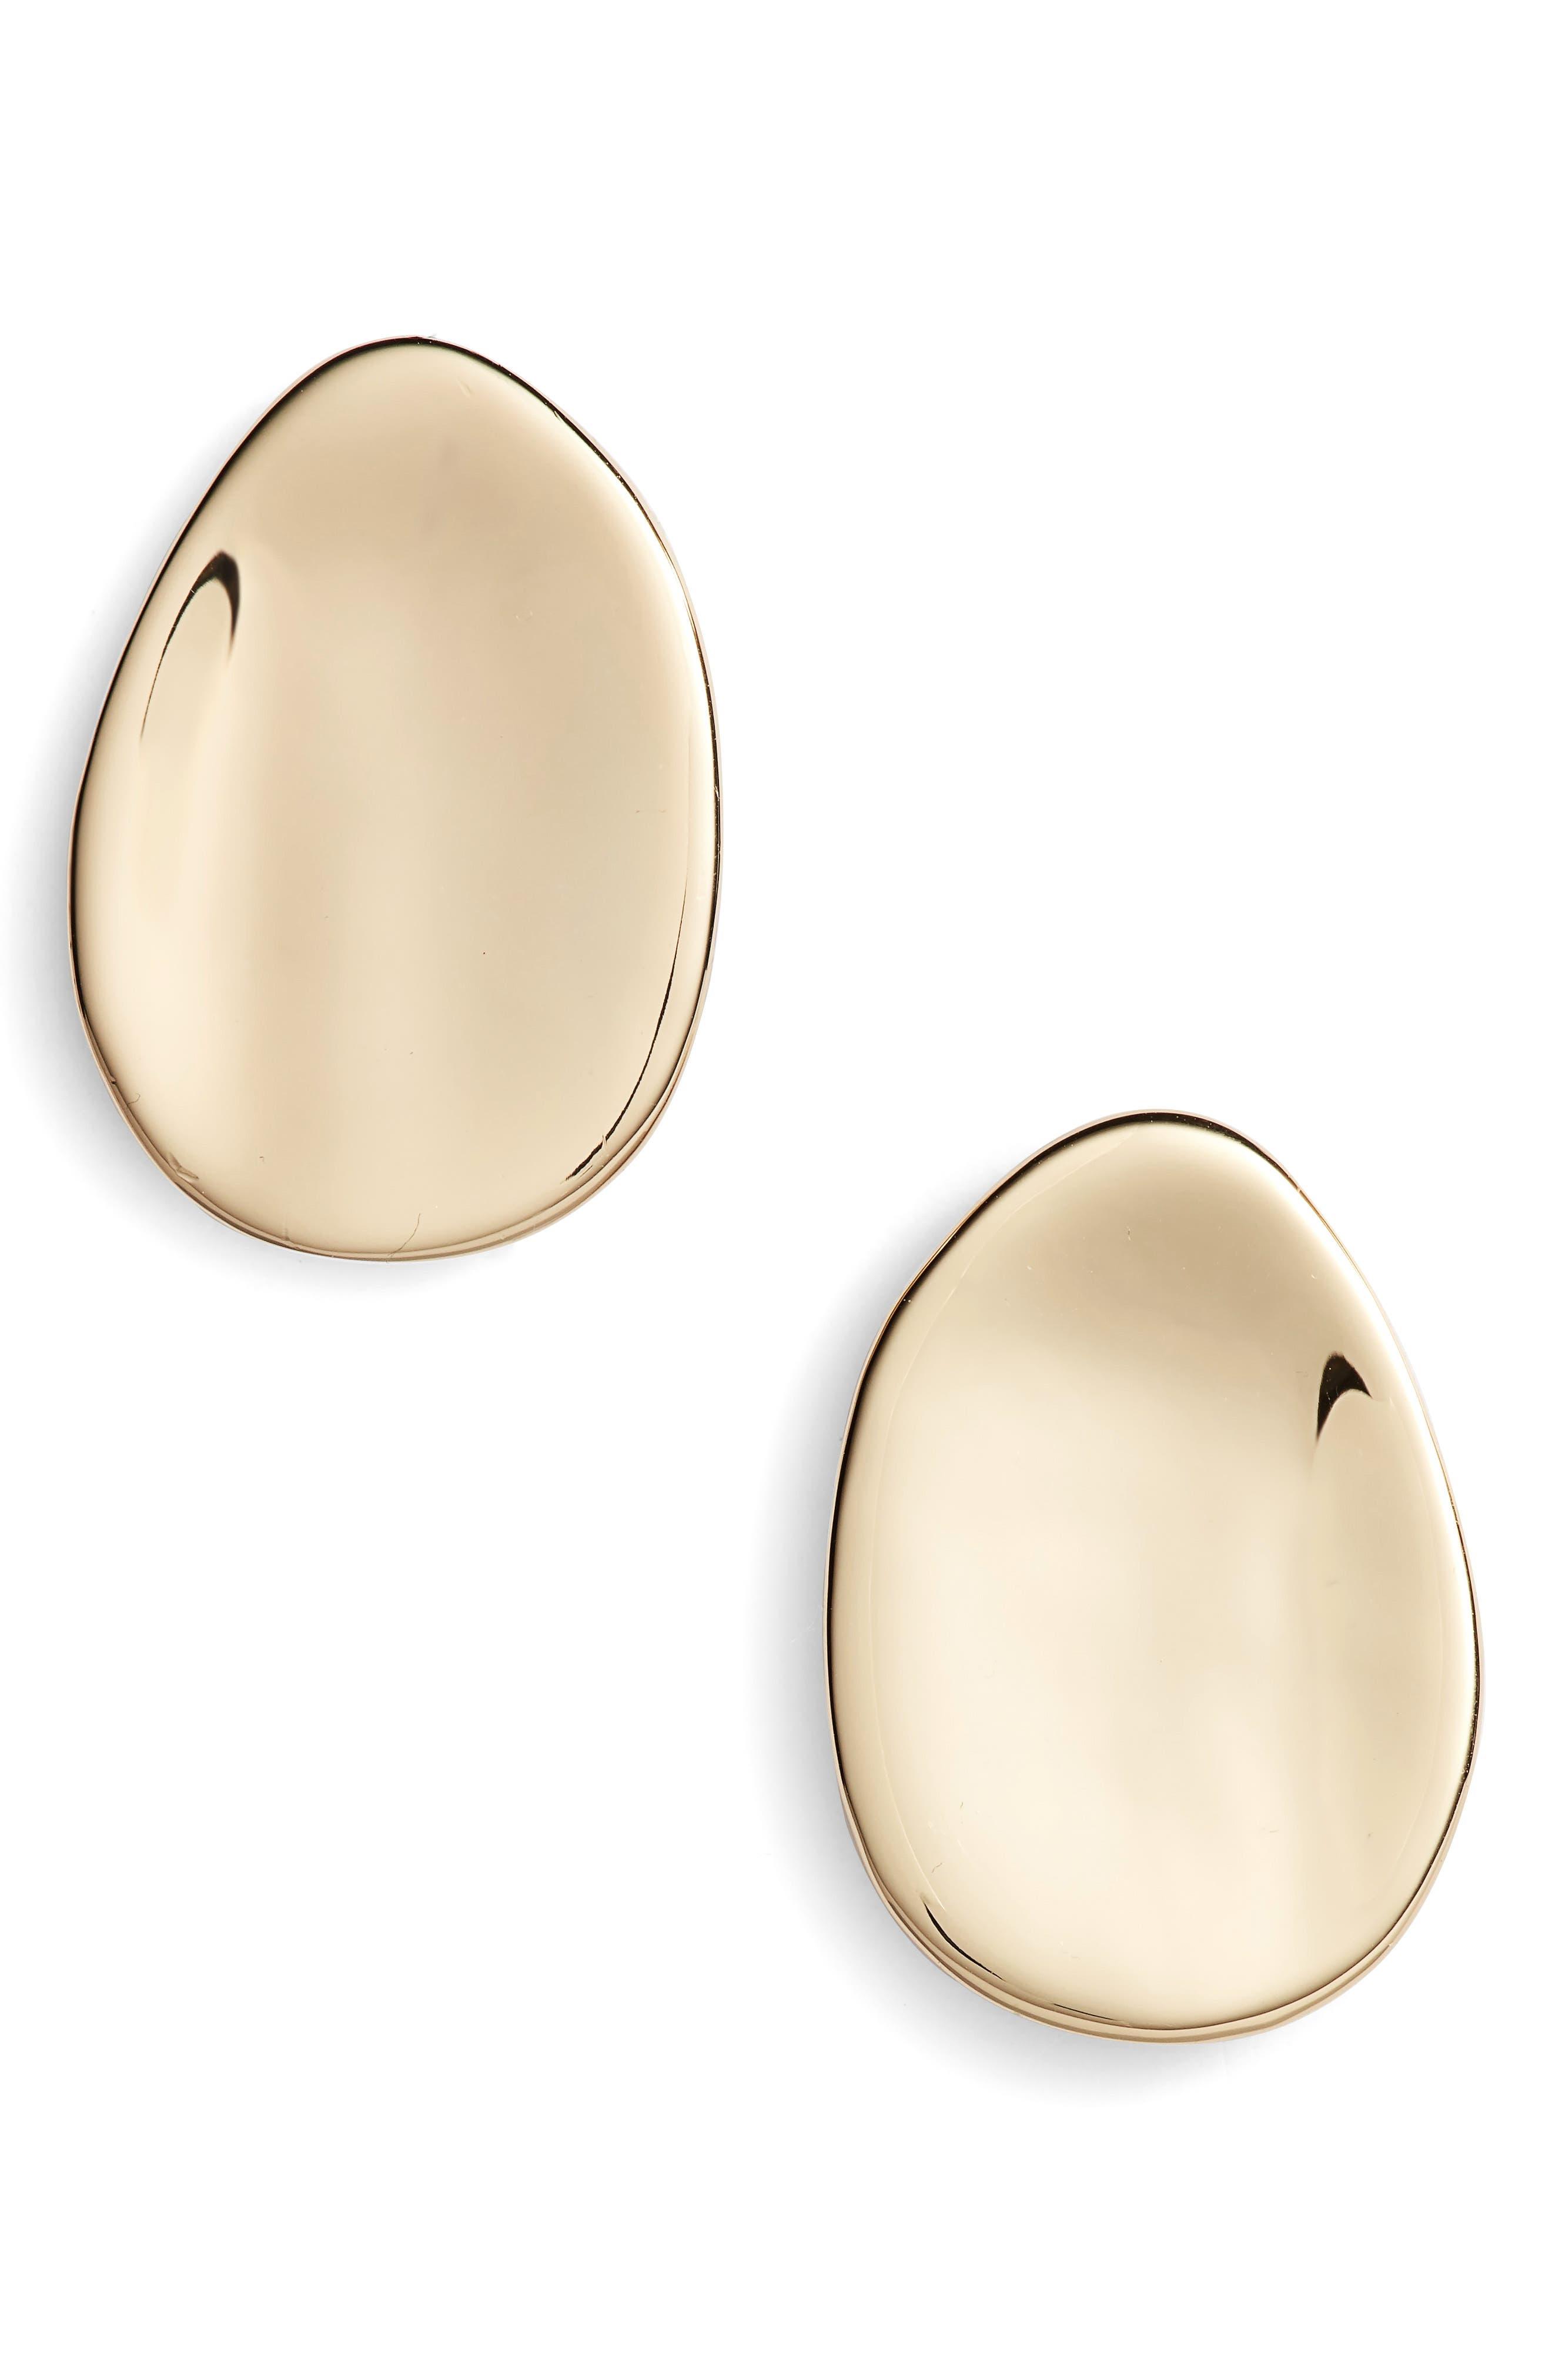 Dish Stud Earrings,                         Main,                         color, Gold